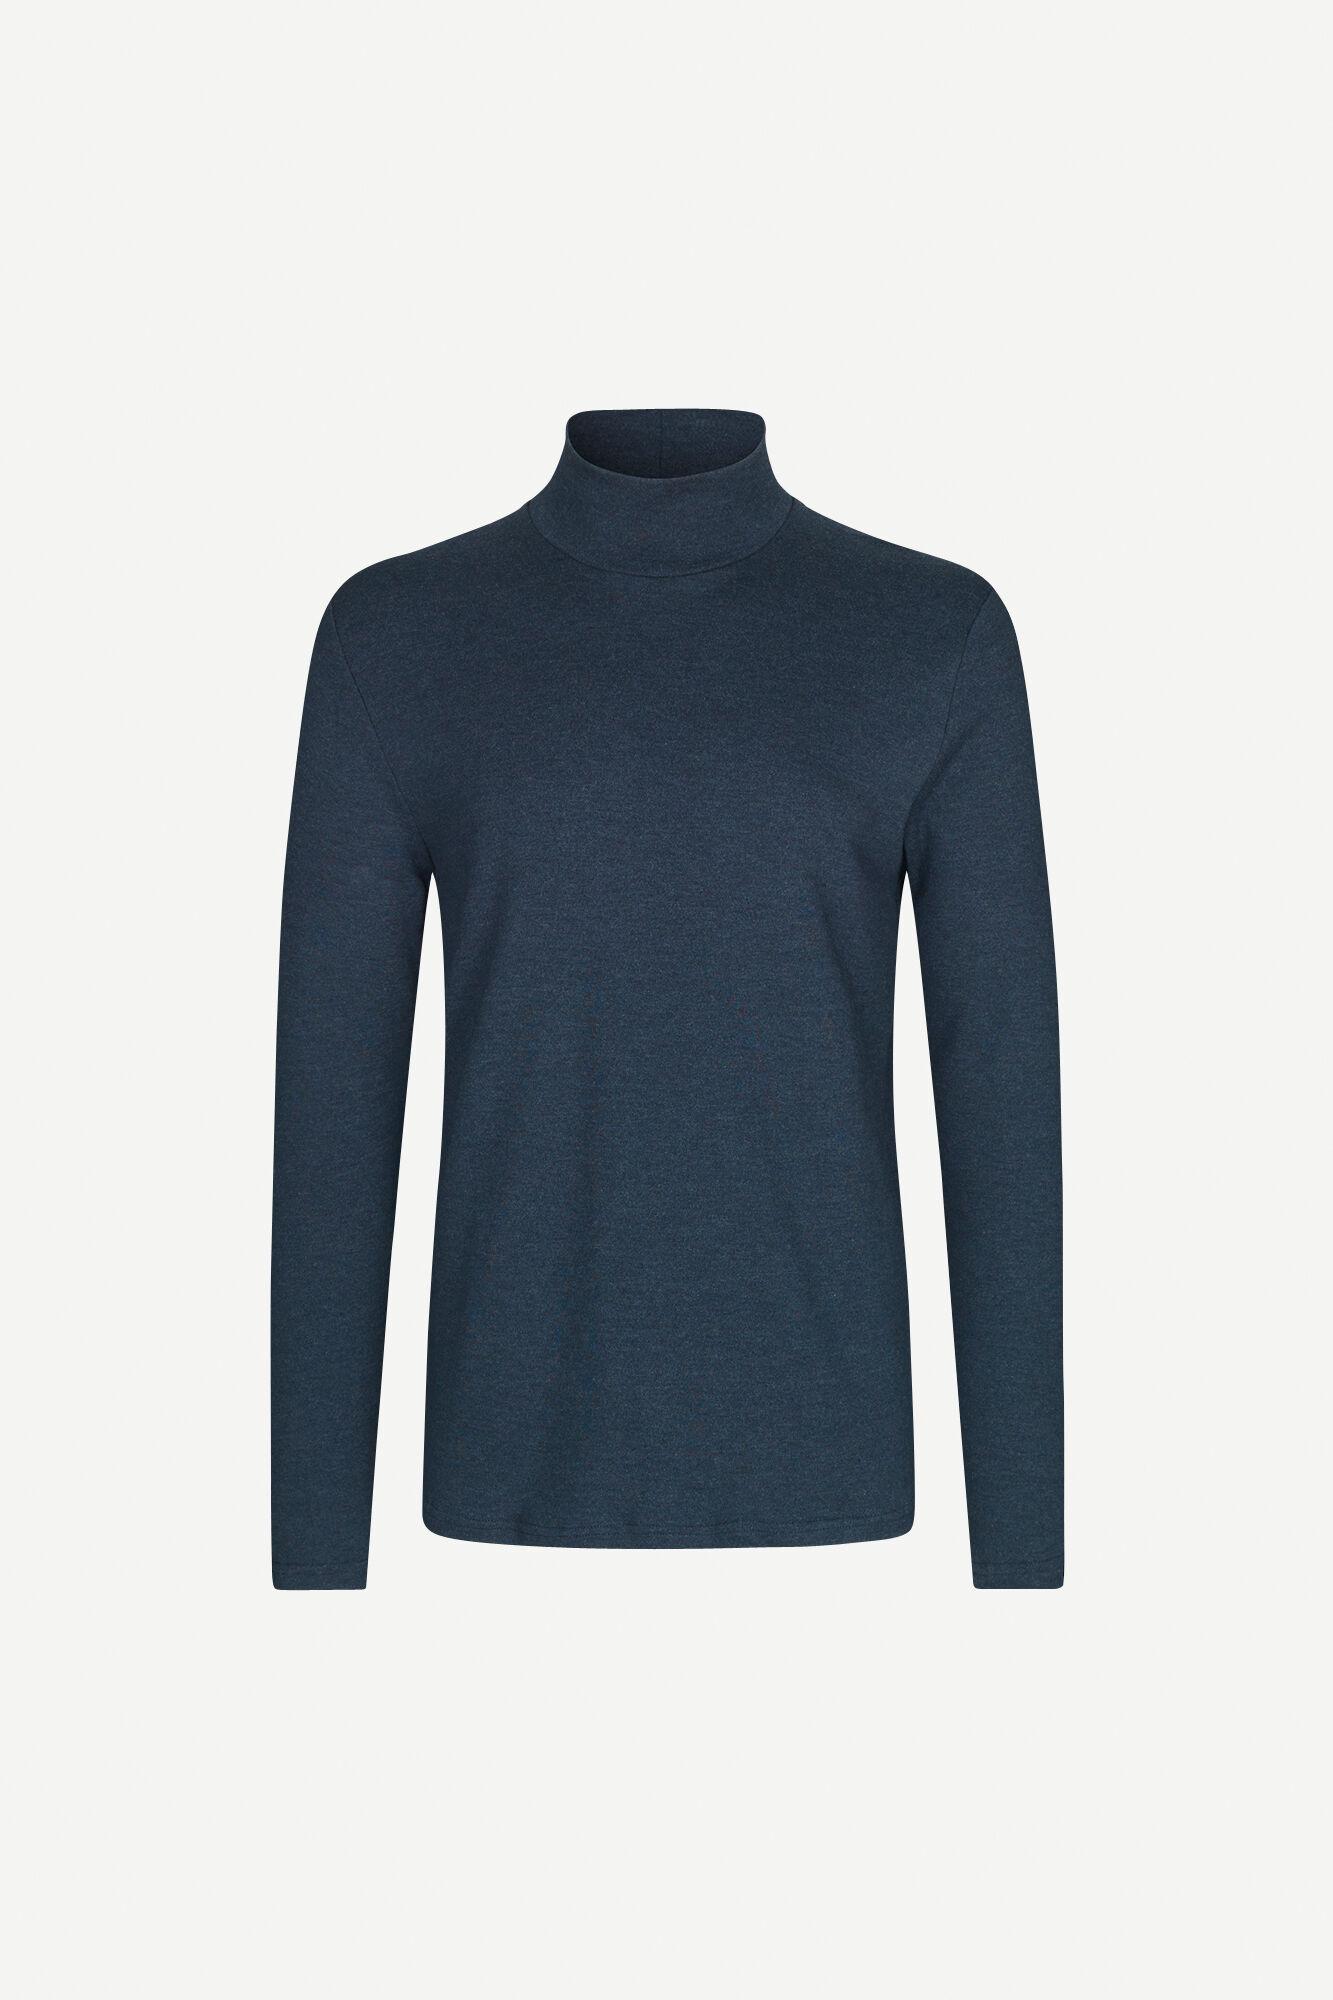 Samsøe & Samsøe Merkur T-N L/S t-shirt